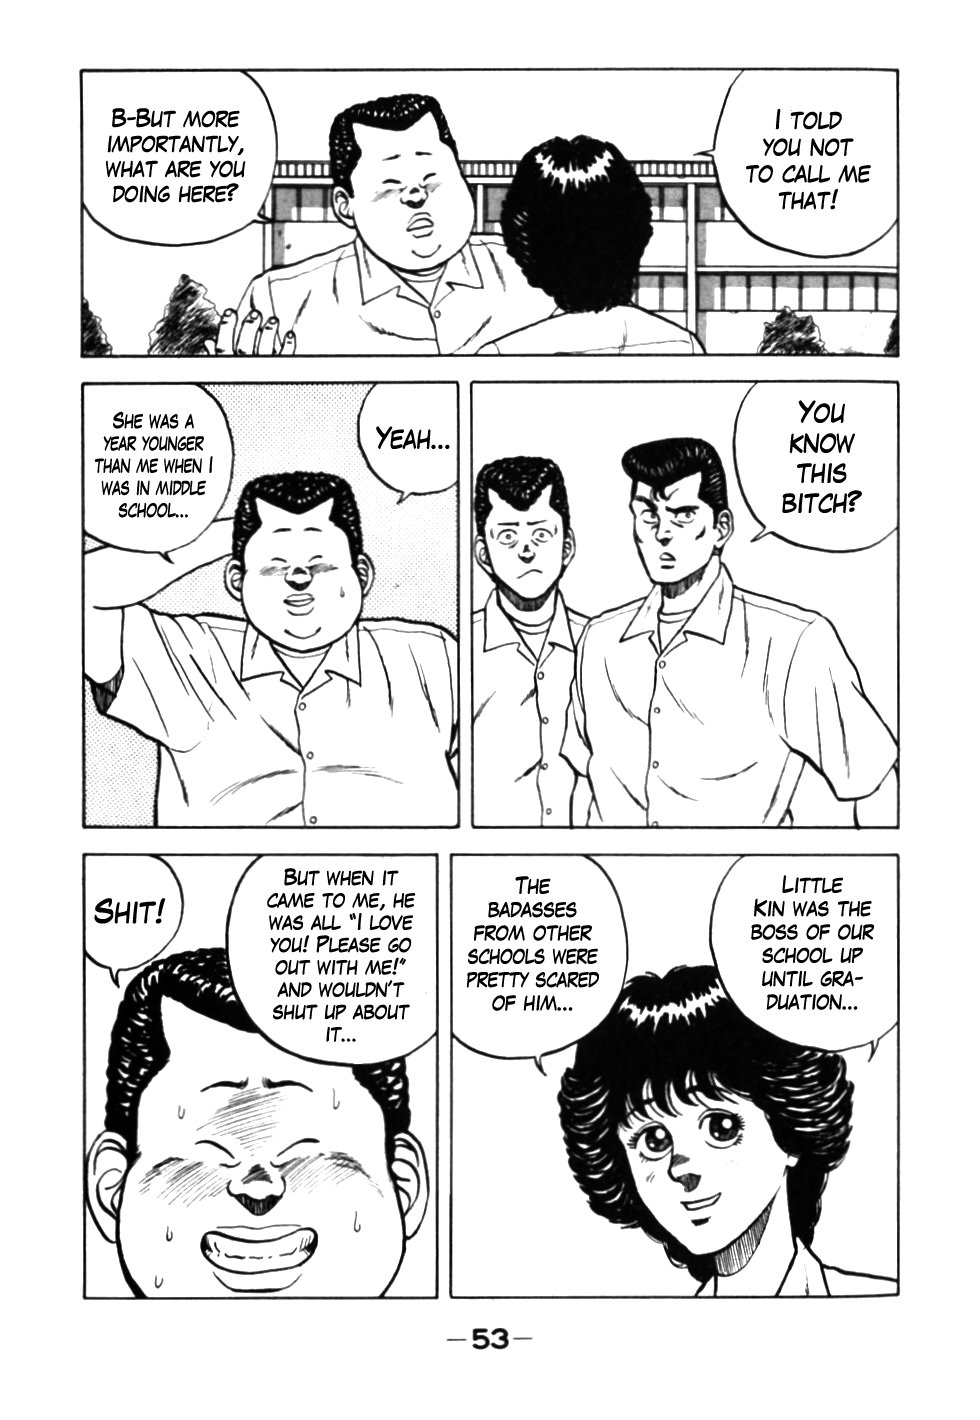 Be-Bop High School Vol.003 Ch.024 Read Online